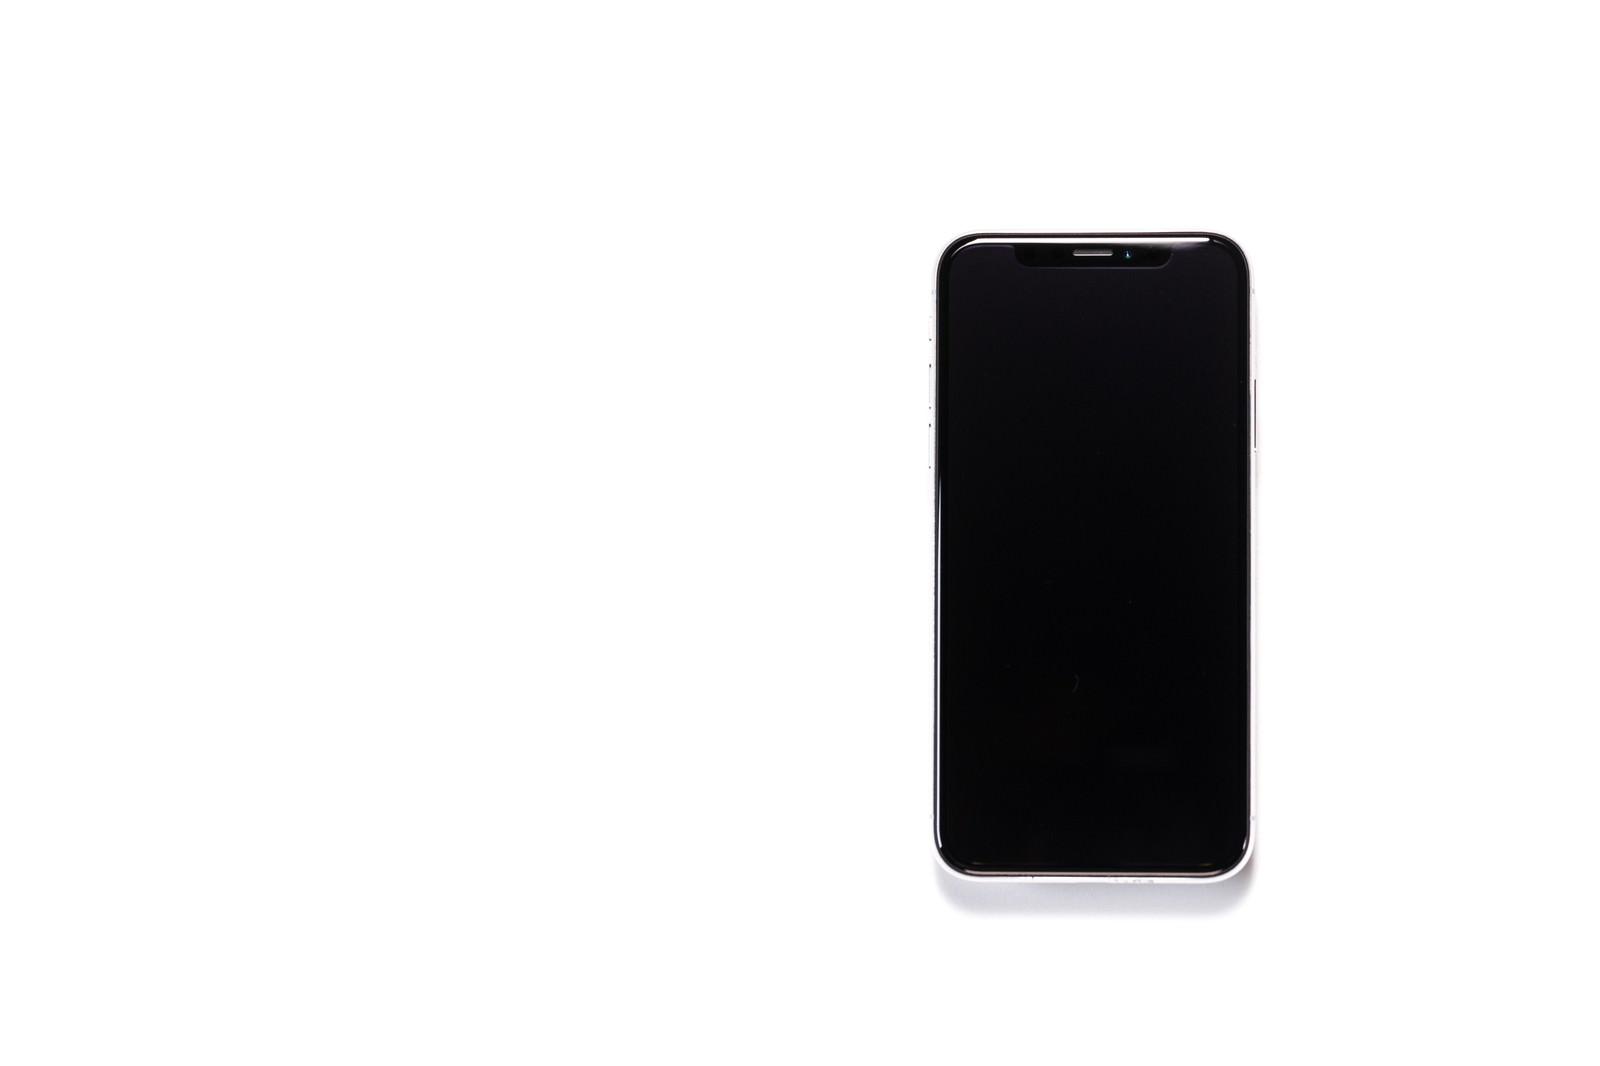 「iPhone X 電源オフ」の写真